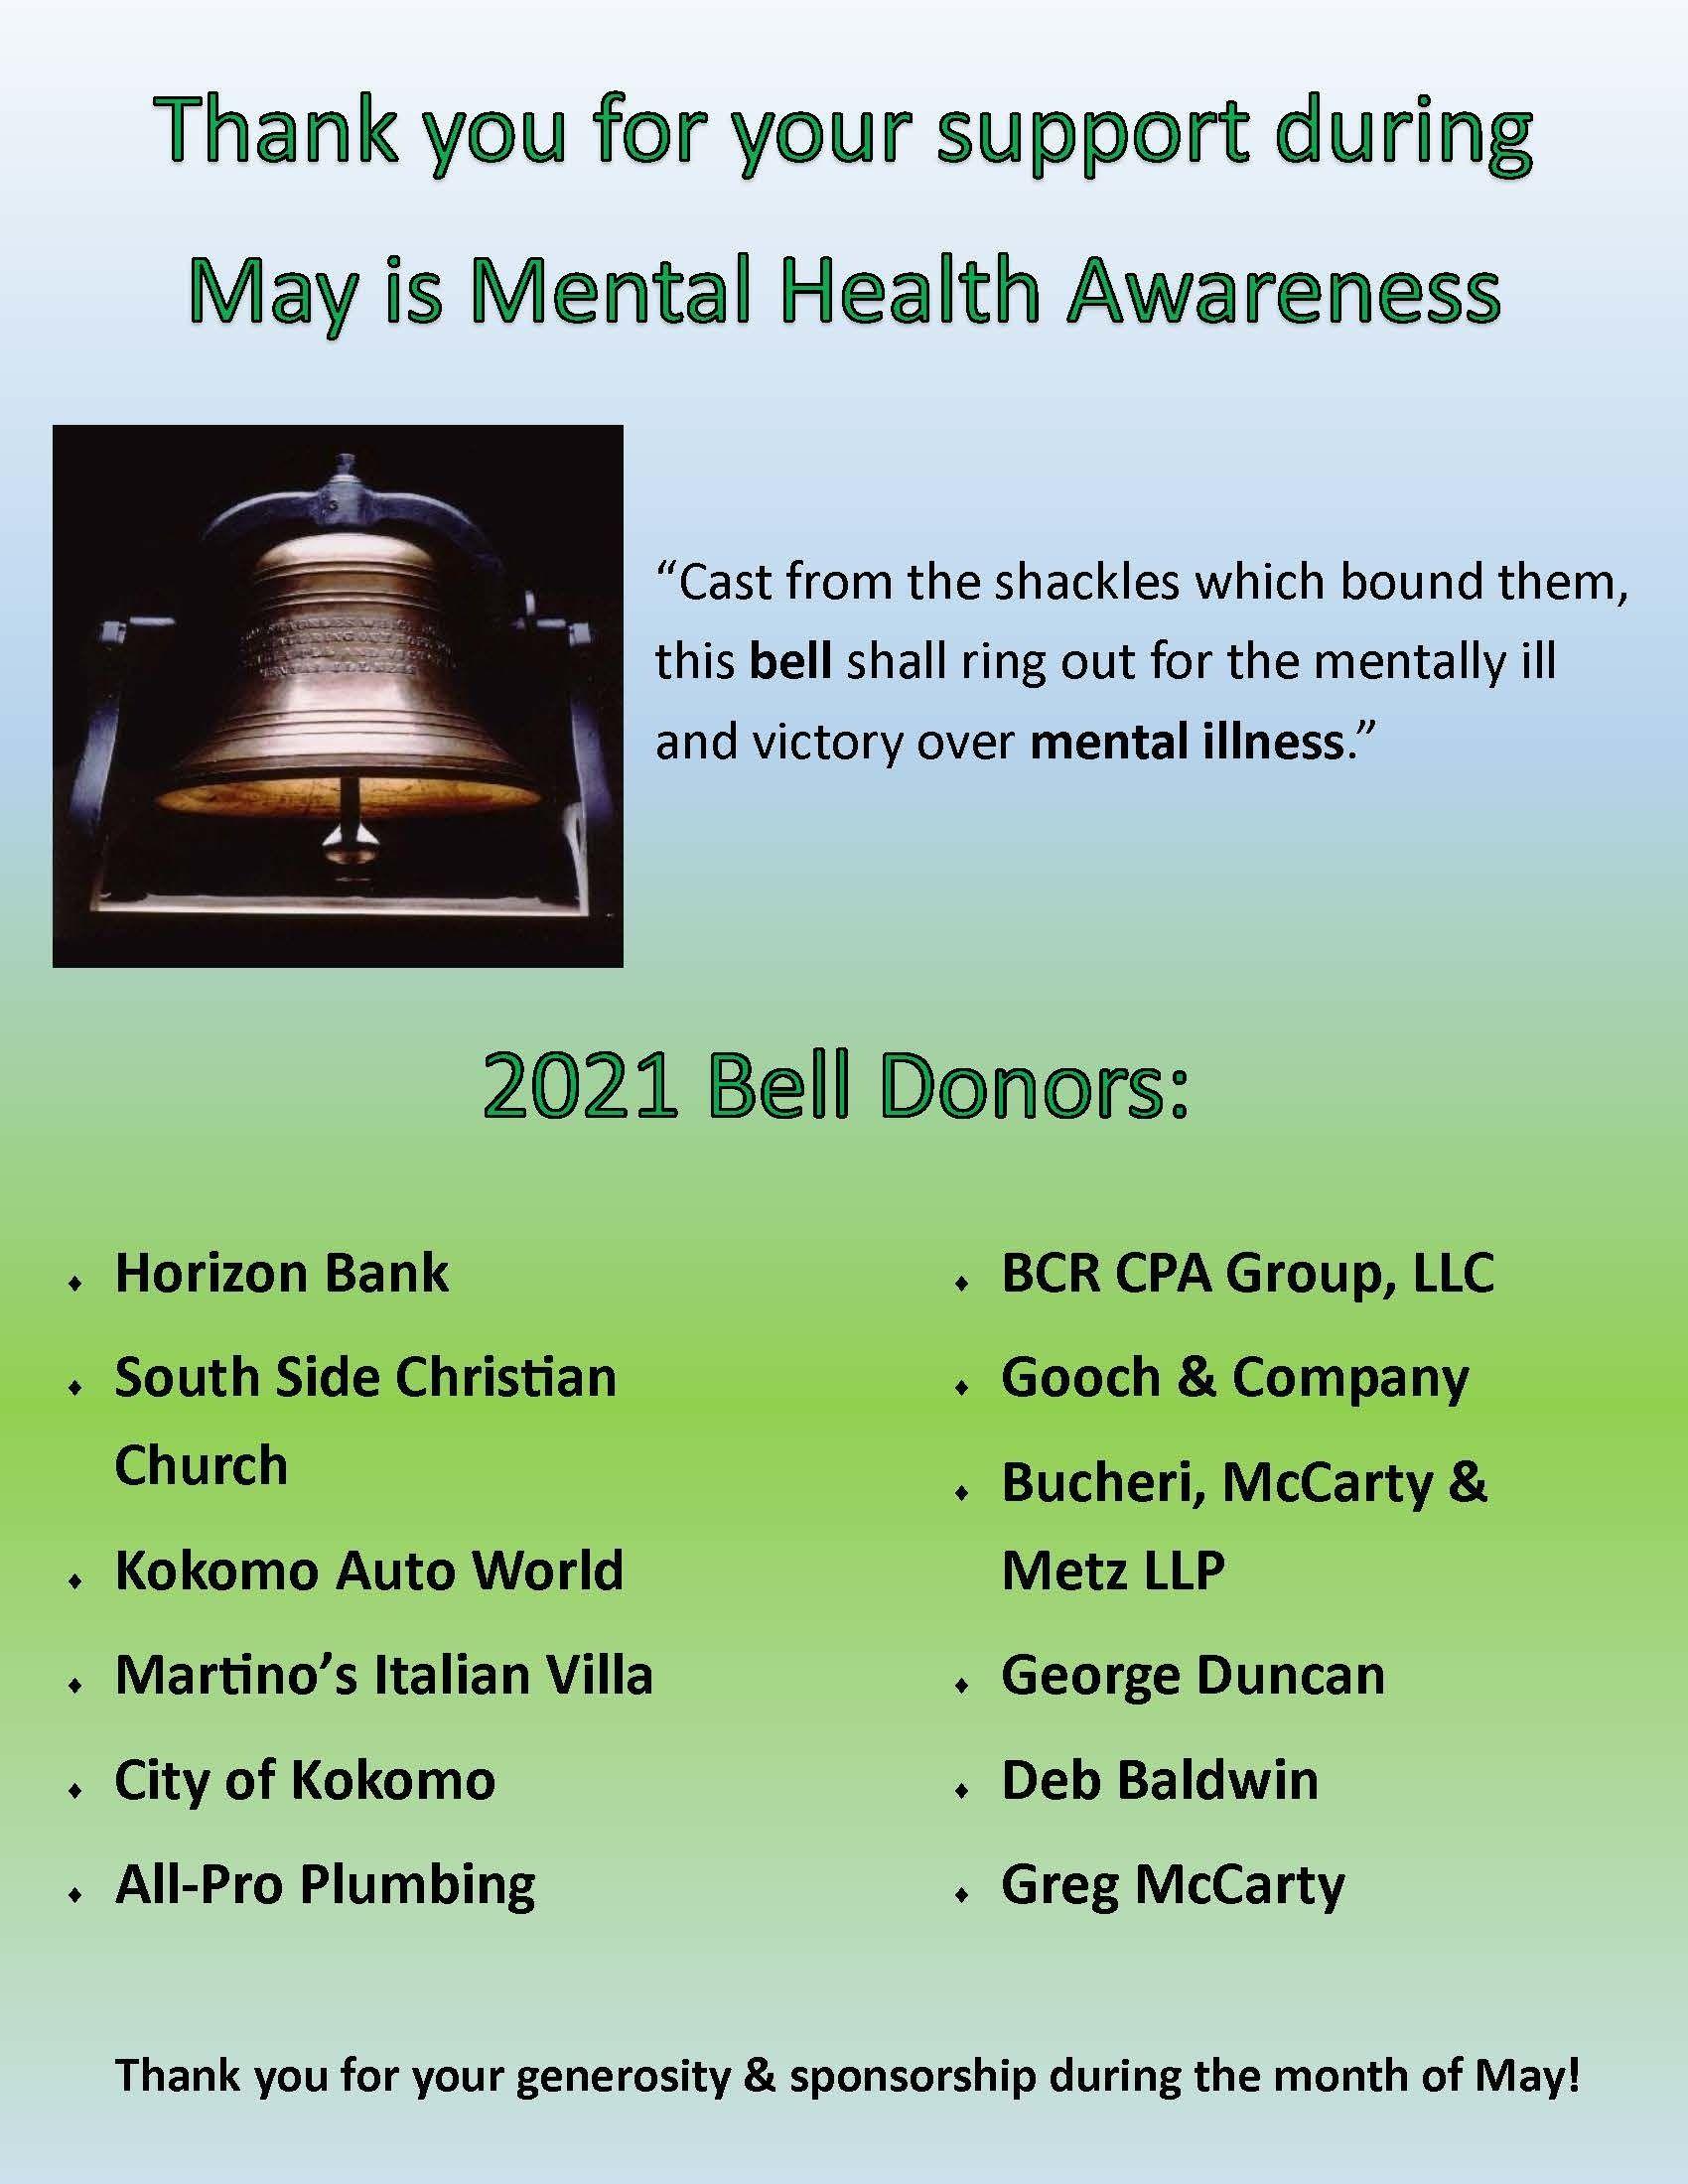 2021 May is Mental Health Awareness Sponsors & Donors